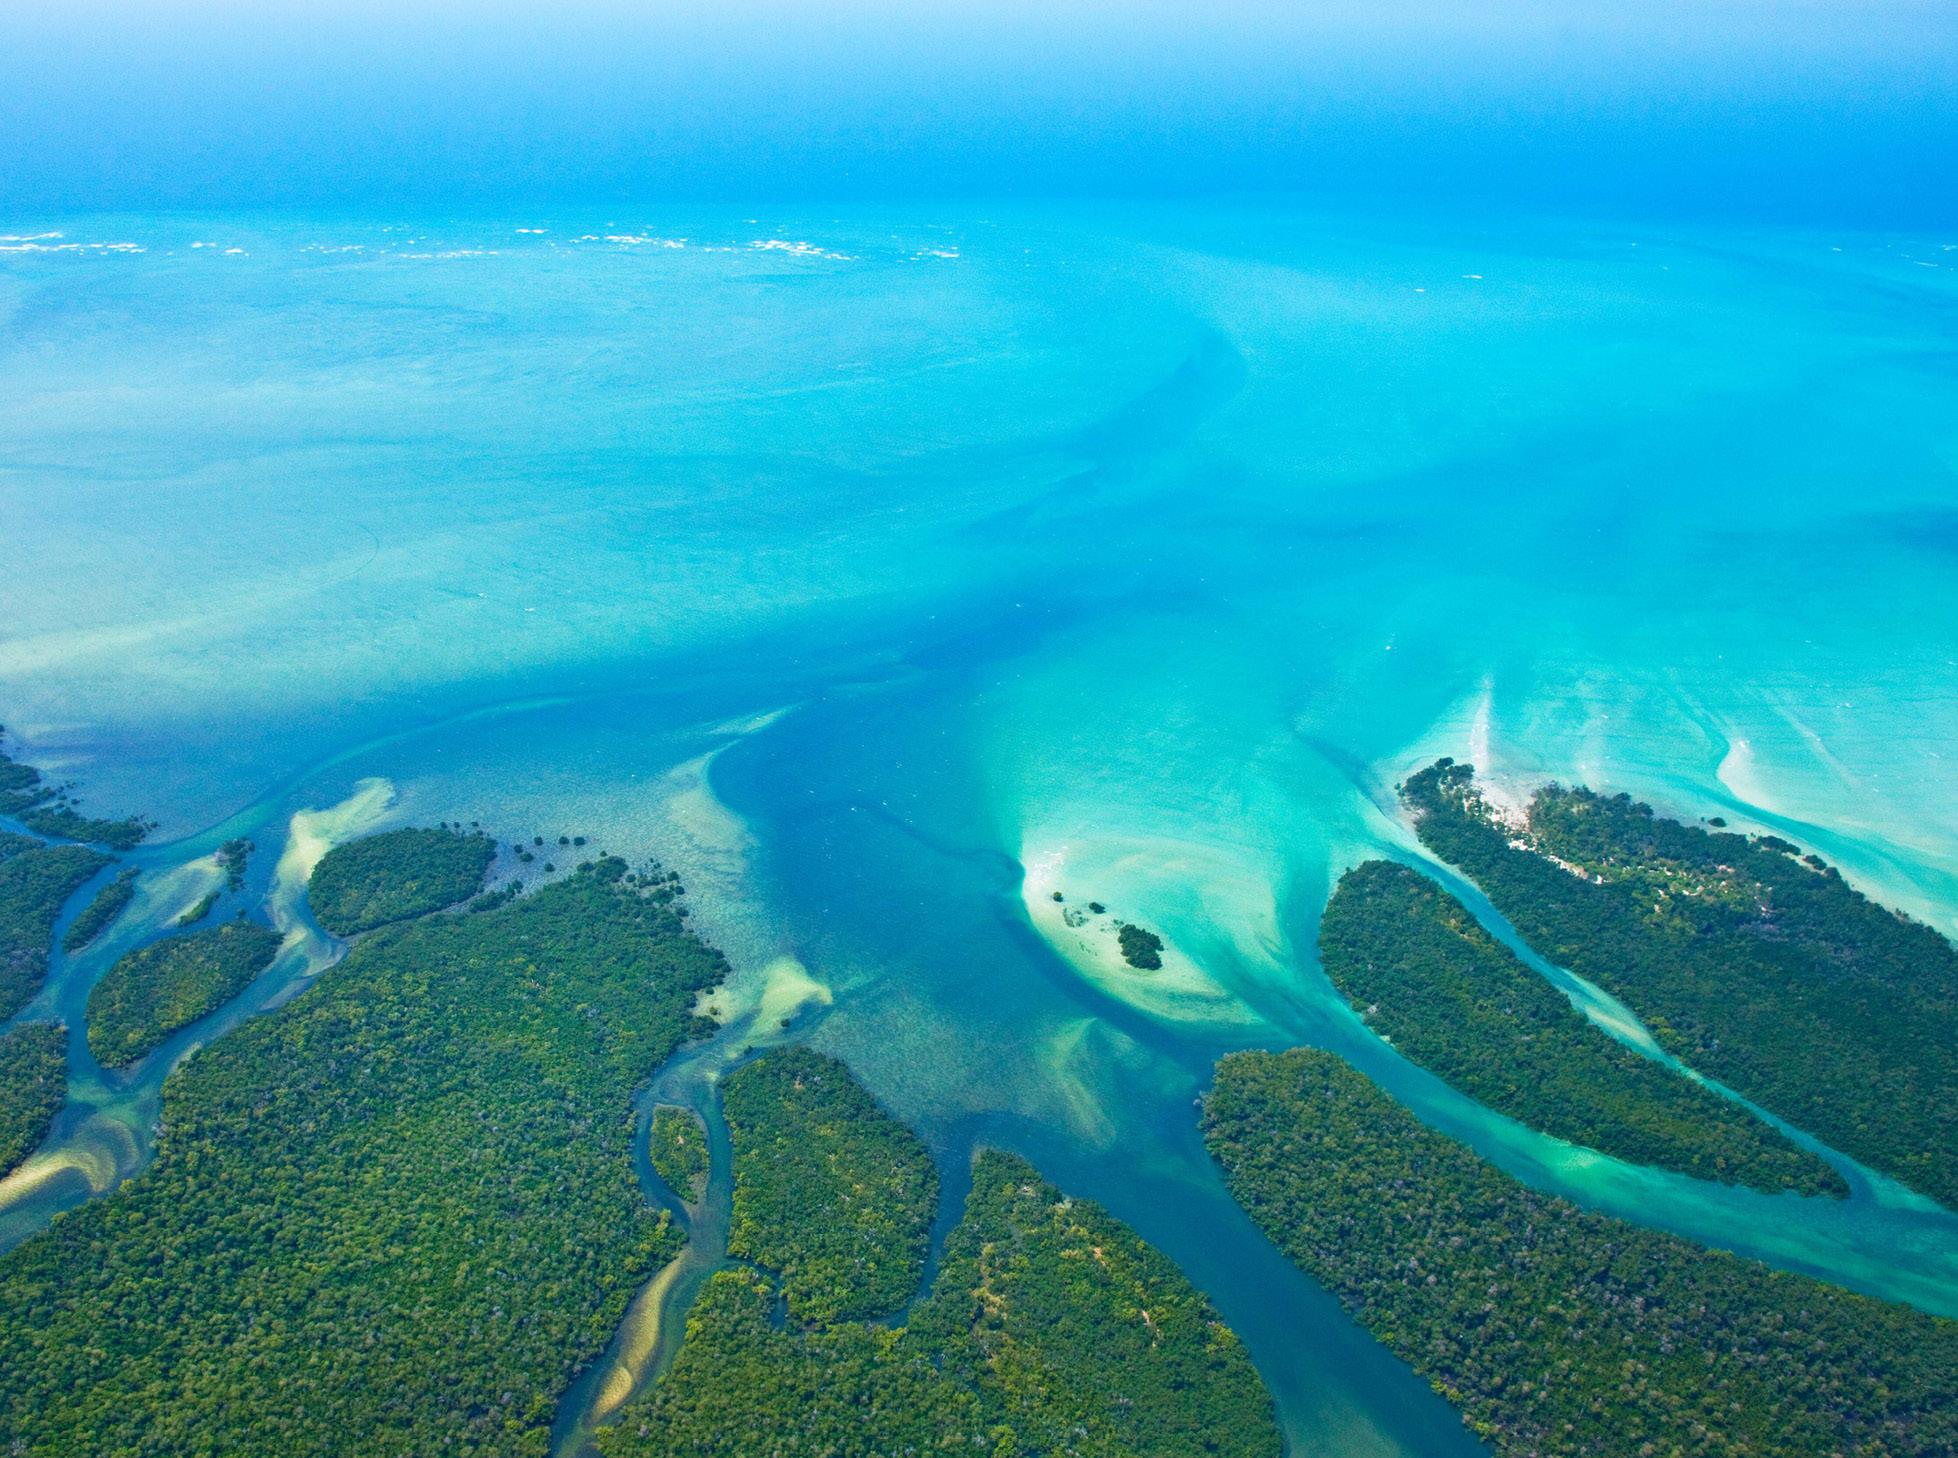 dhow-safari-northern-mozambique-birdseye-view